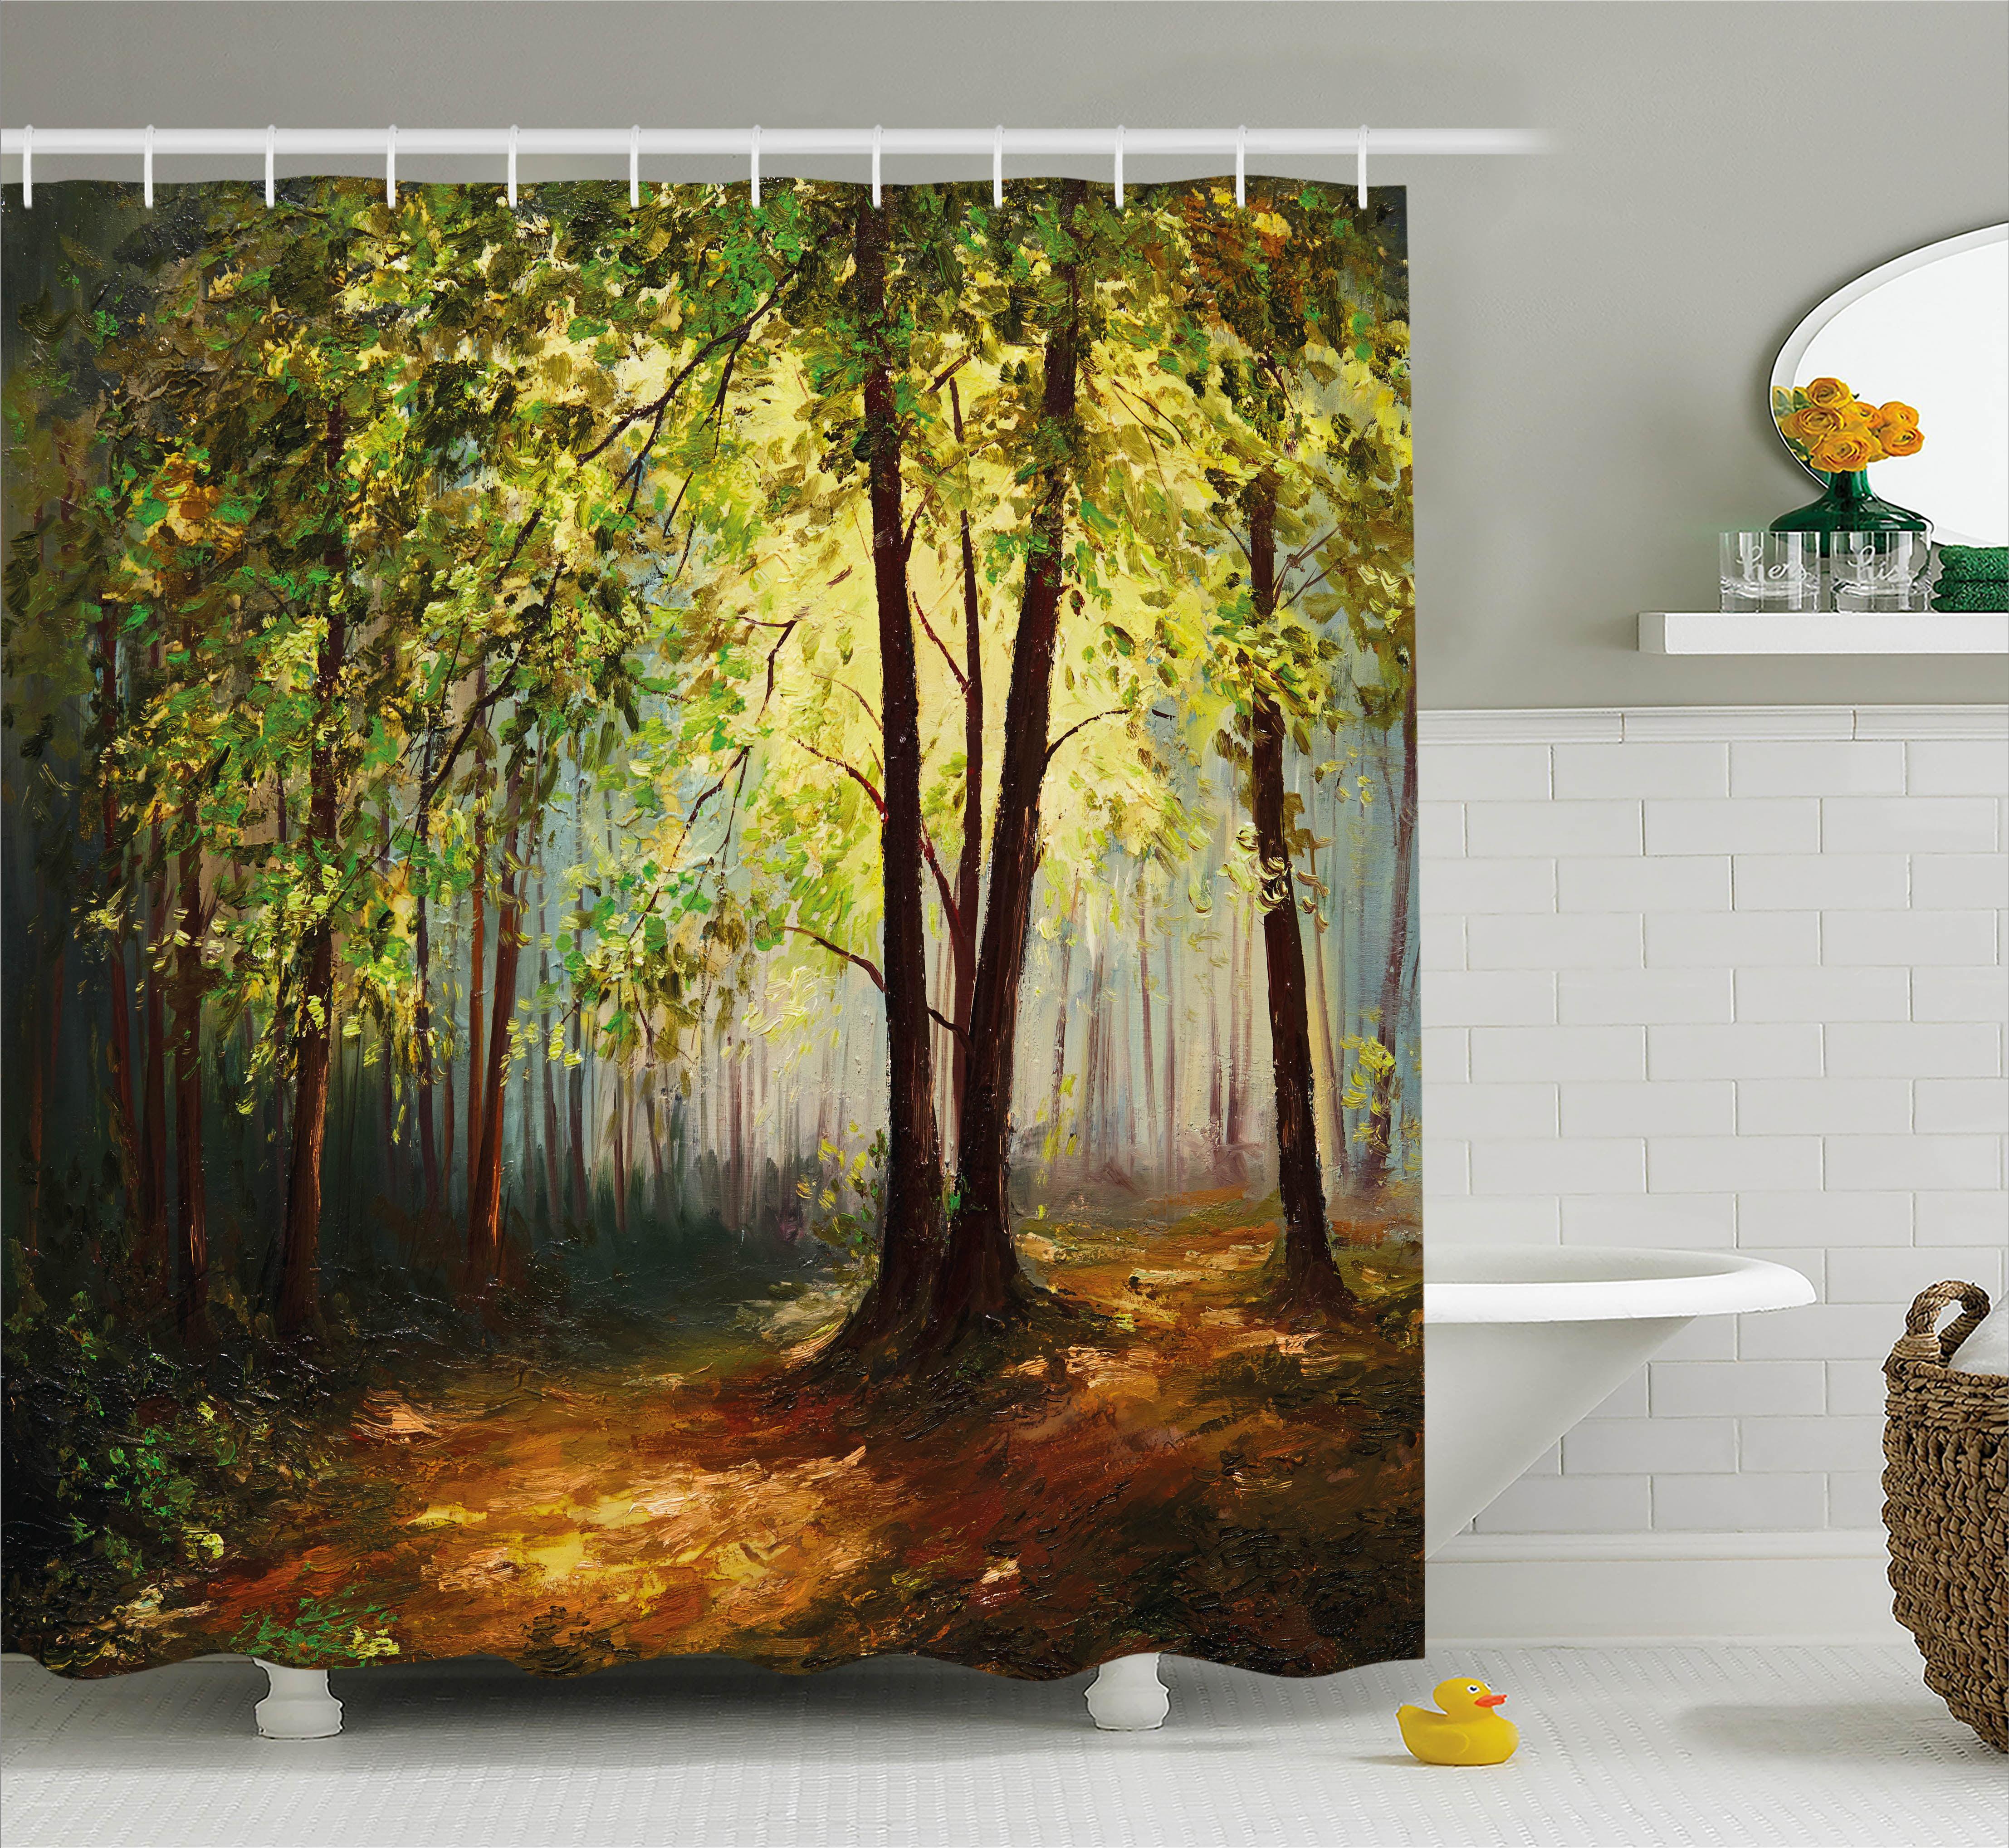 Image Result For Fern Shower Curtain Hooks